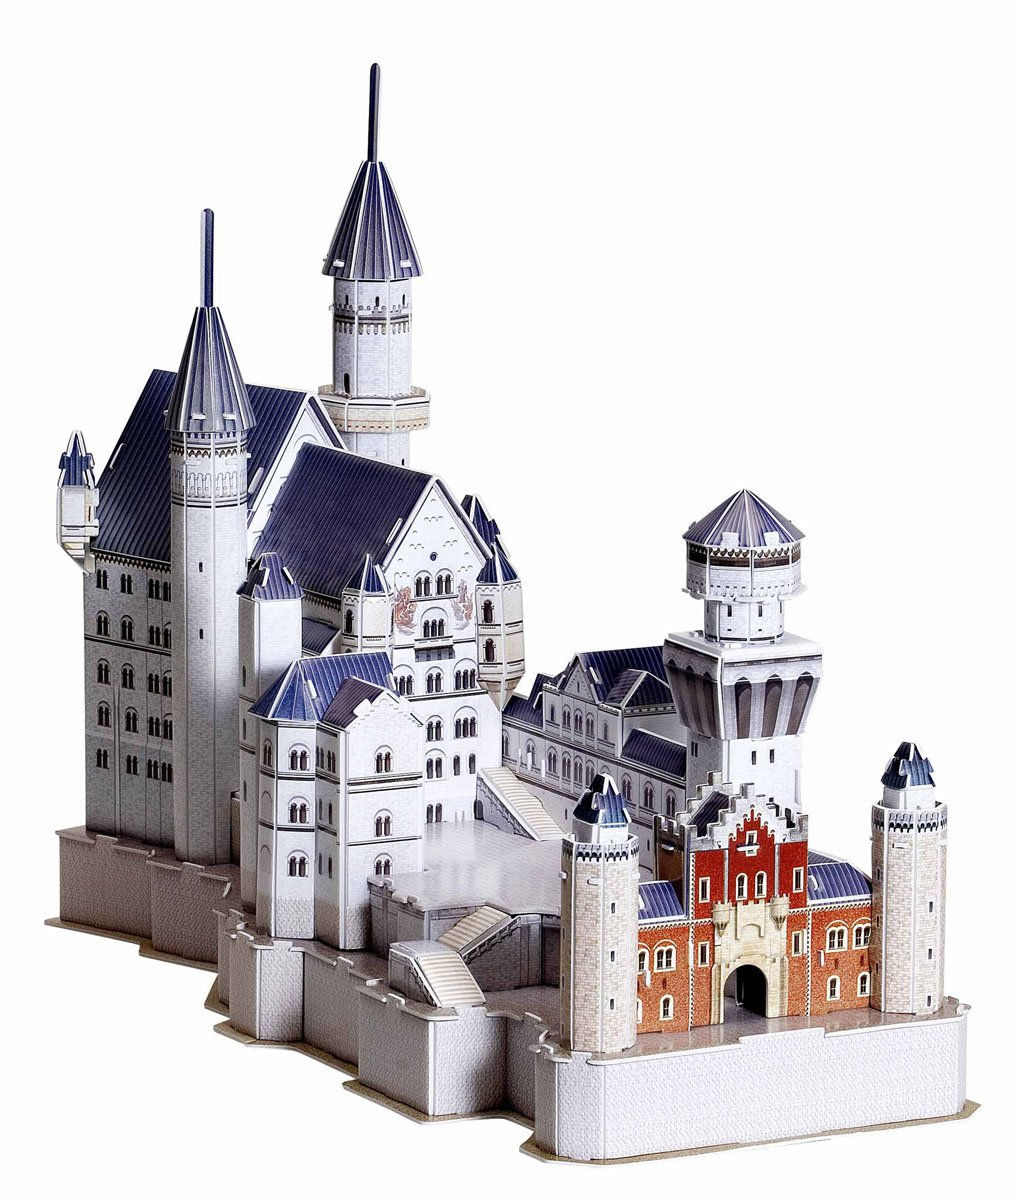 Aoshima Sky Net POP Out World Solid Puzzle No.02 Schloss Neuschwanstein by Aoshima